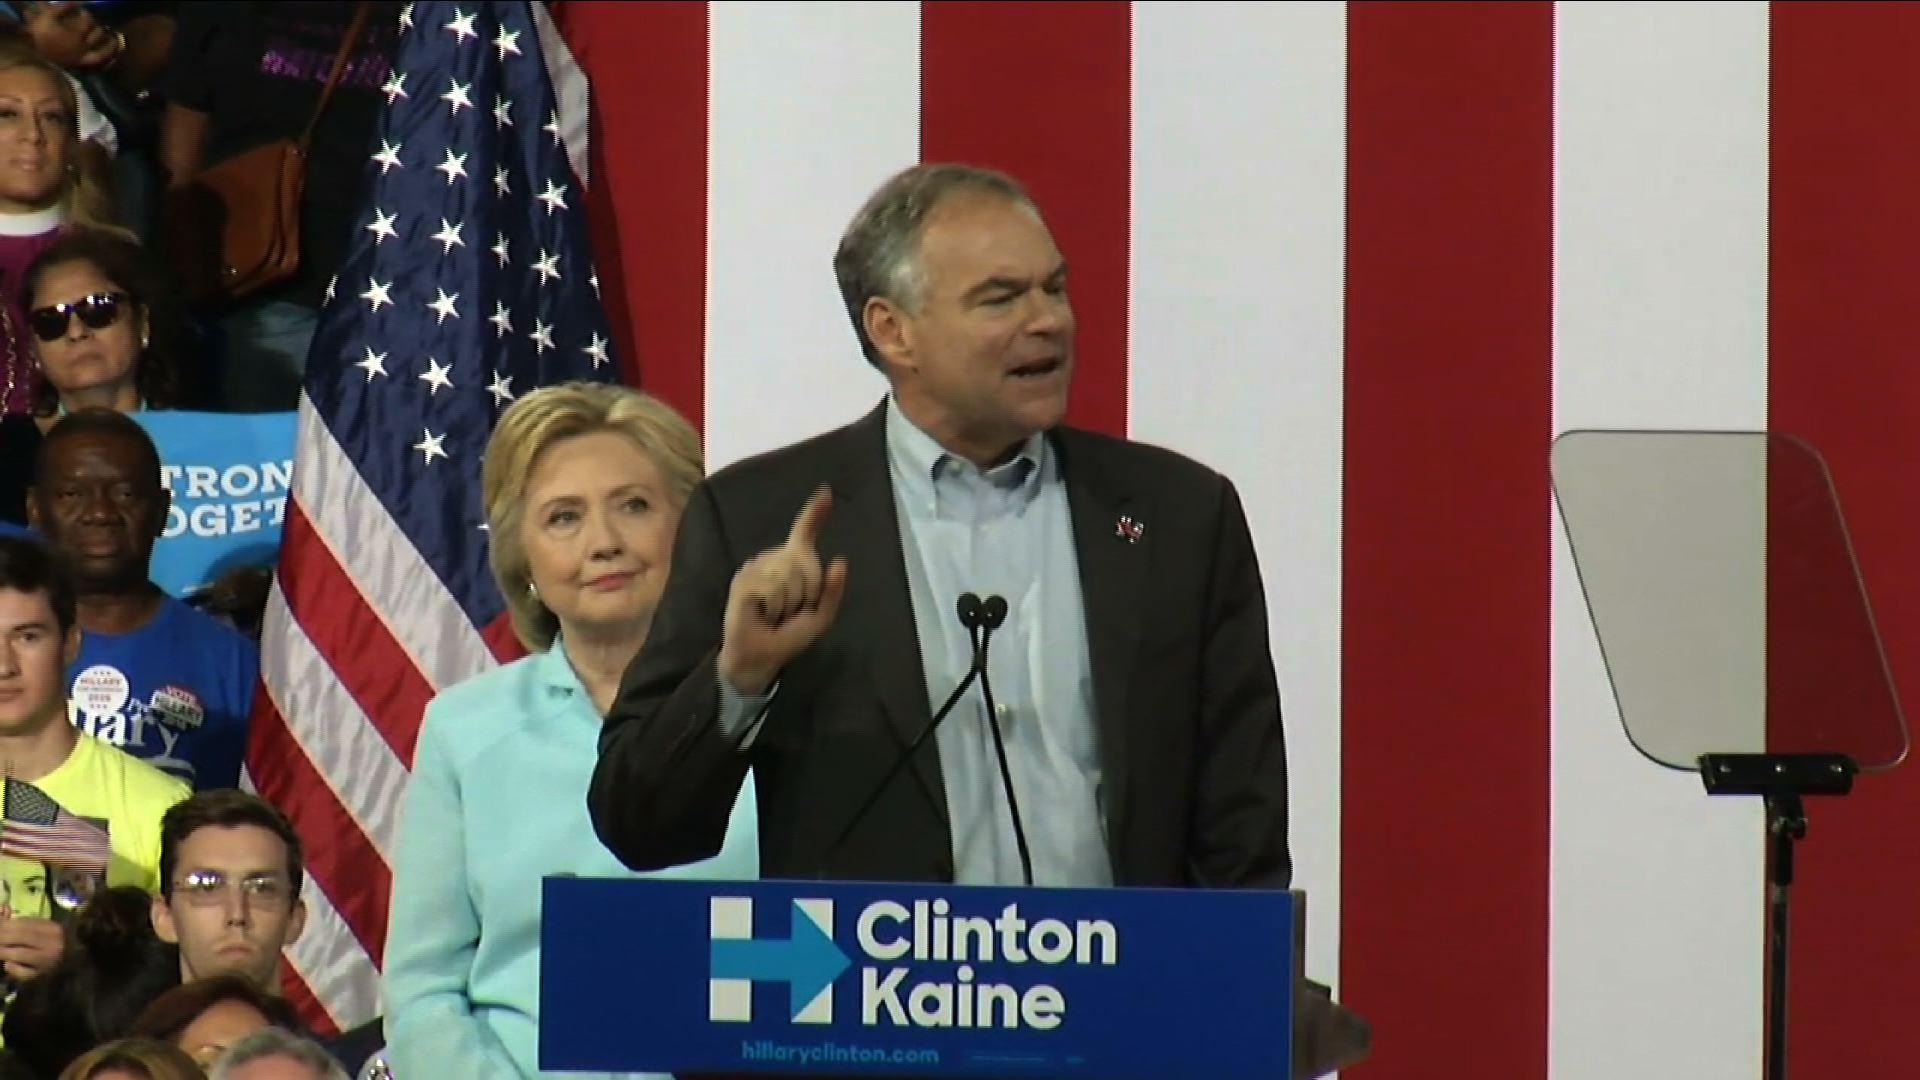 Kaine: Clinton is 'Opposite of Trump'